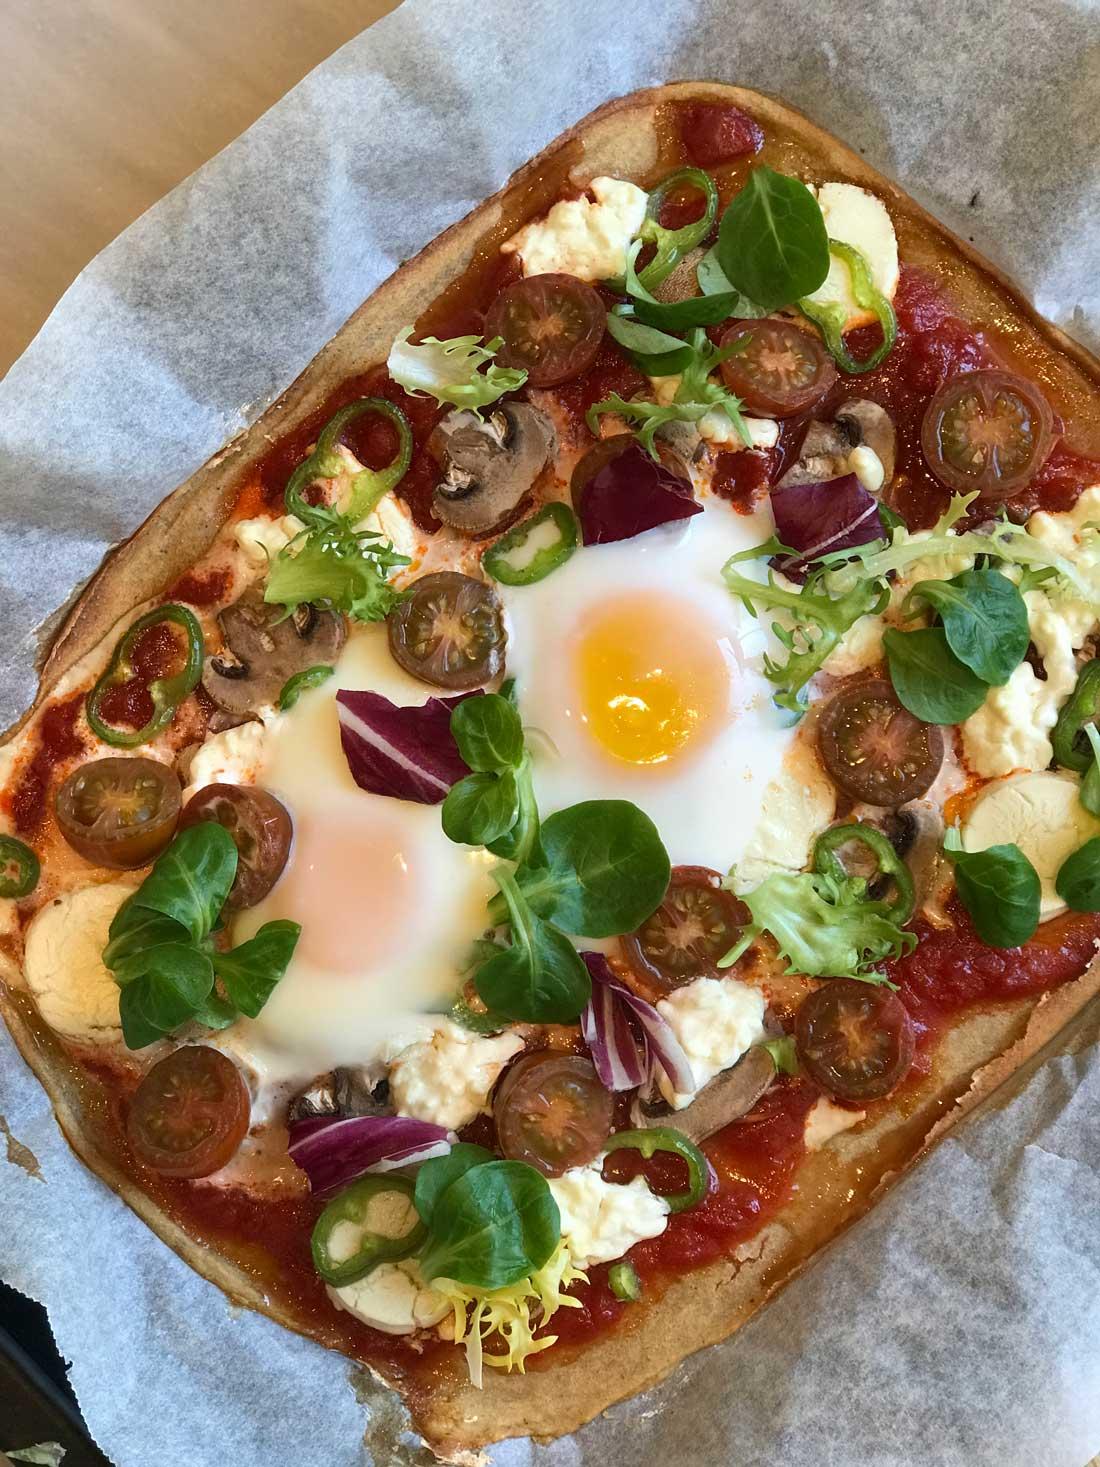 pizza con base de quinoa sin gluten Come Vive Viaja receta